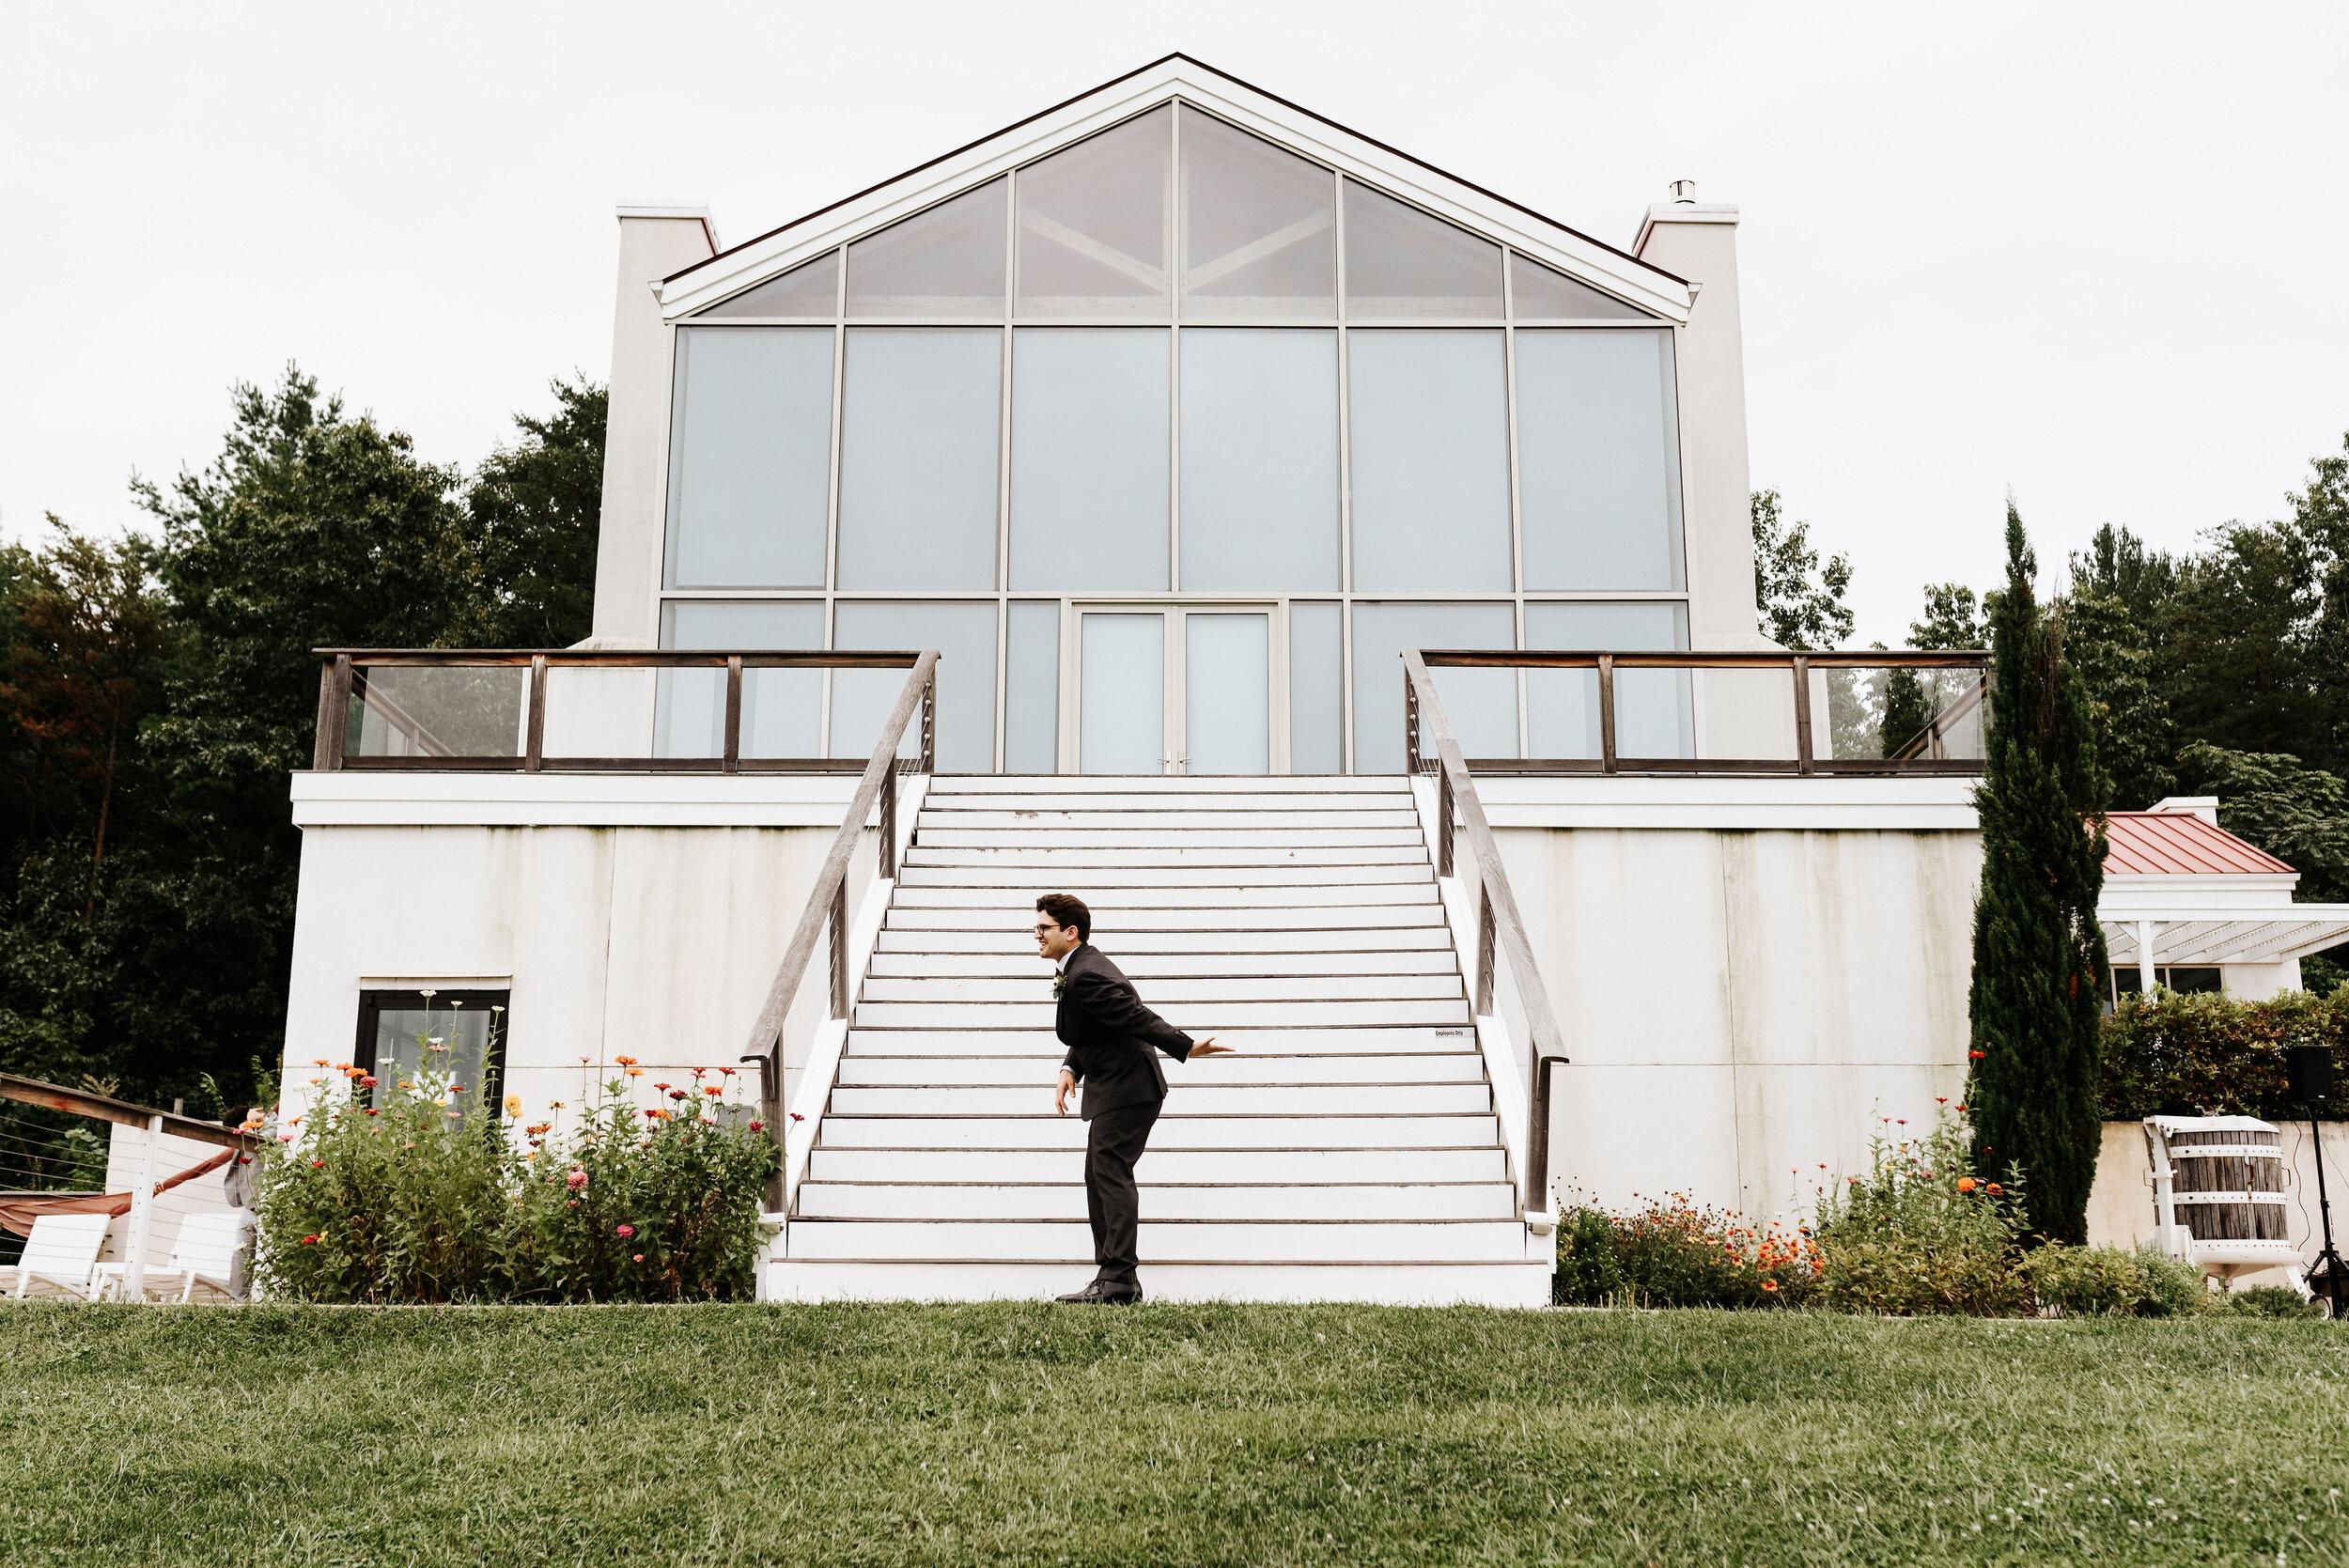 Allison_Nolan_Moss_Vineyards_Wedding_Charlottesville_Virginia_Photography_by_V_25.jpg